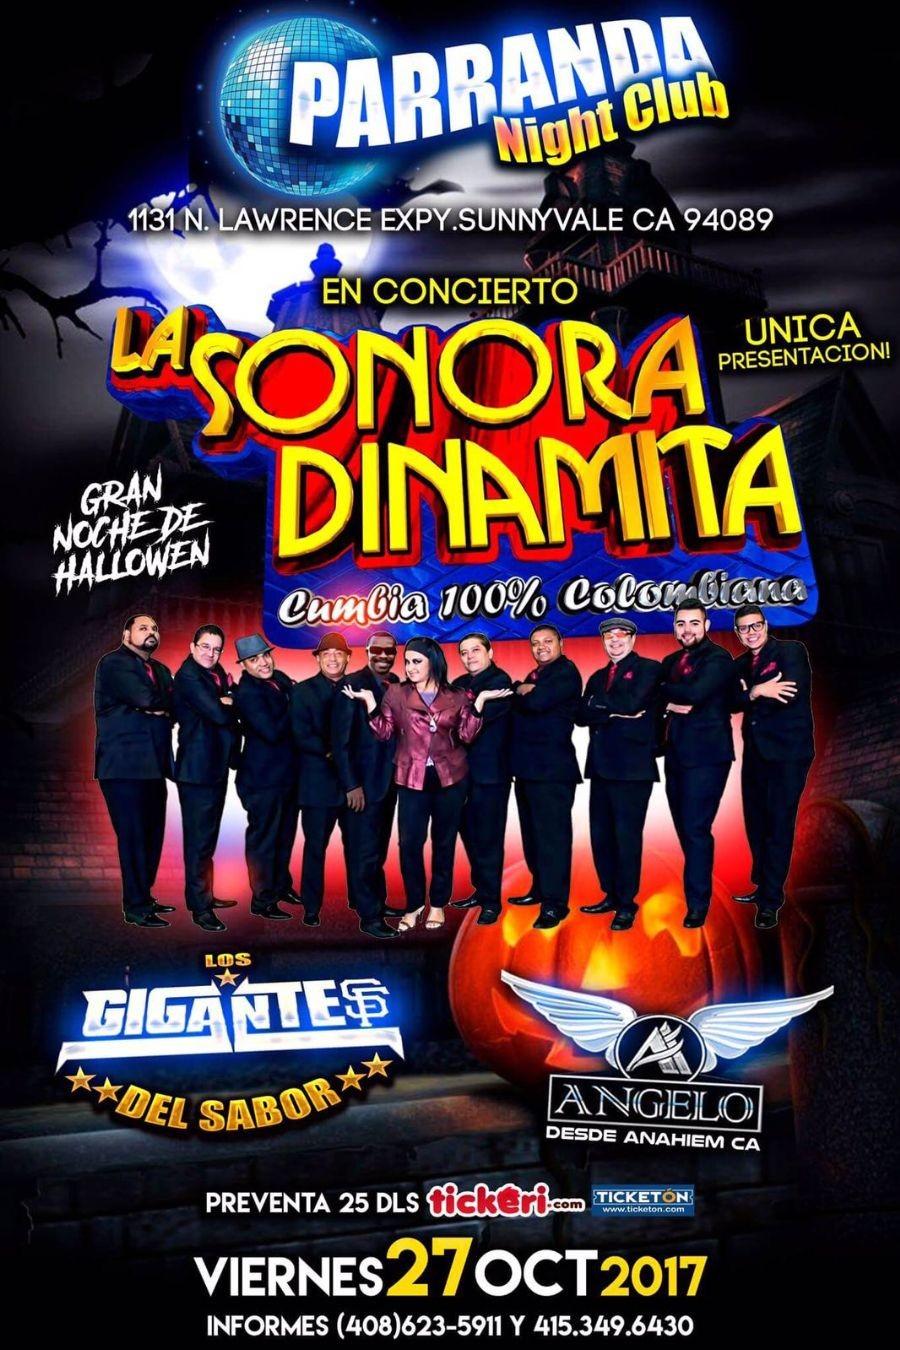 La Sonora Dinamita en Sunnyvale @ Parranda  | Sunnyvale | California | United States